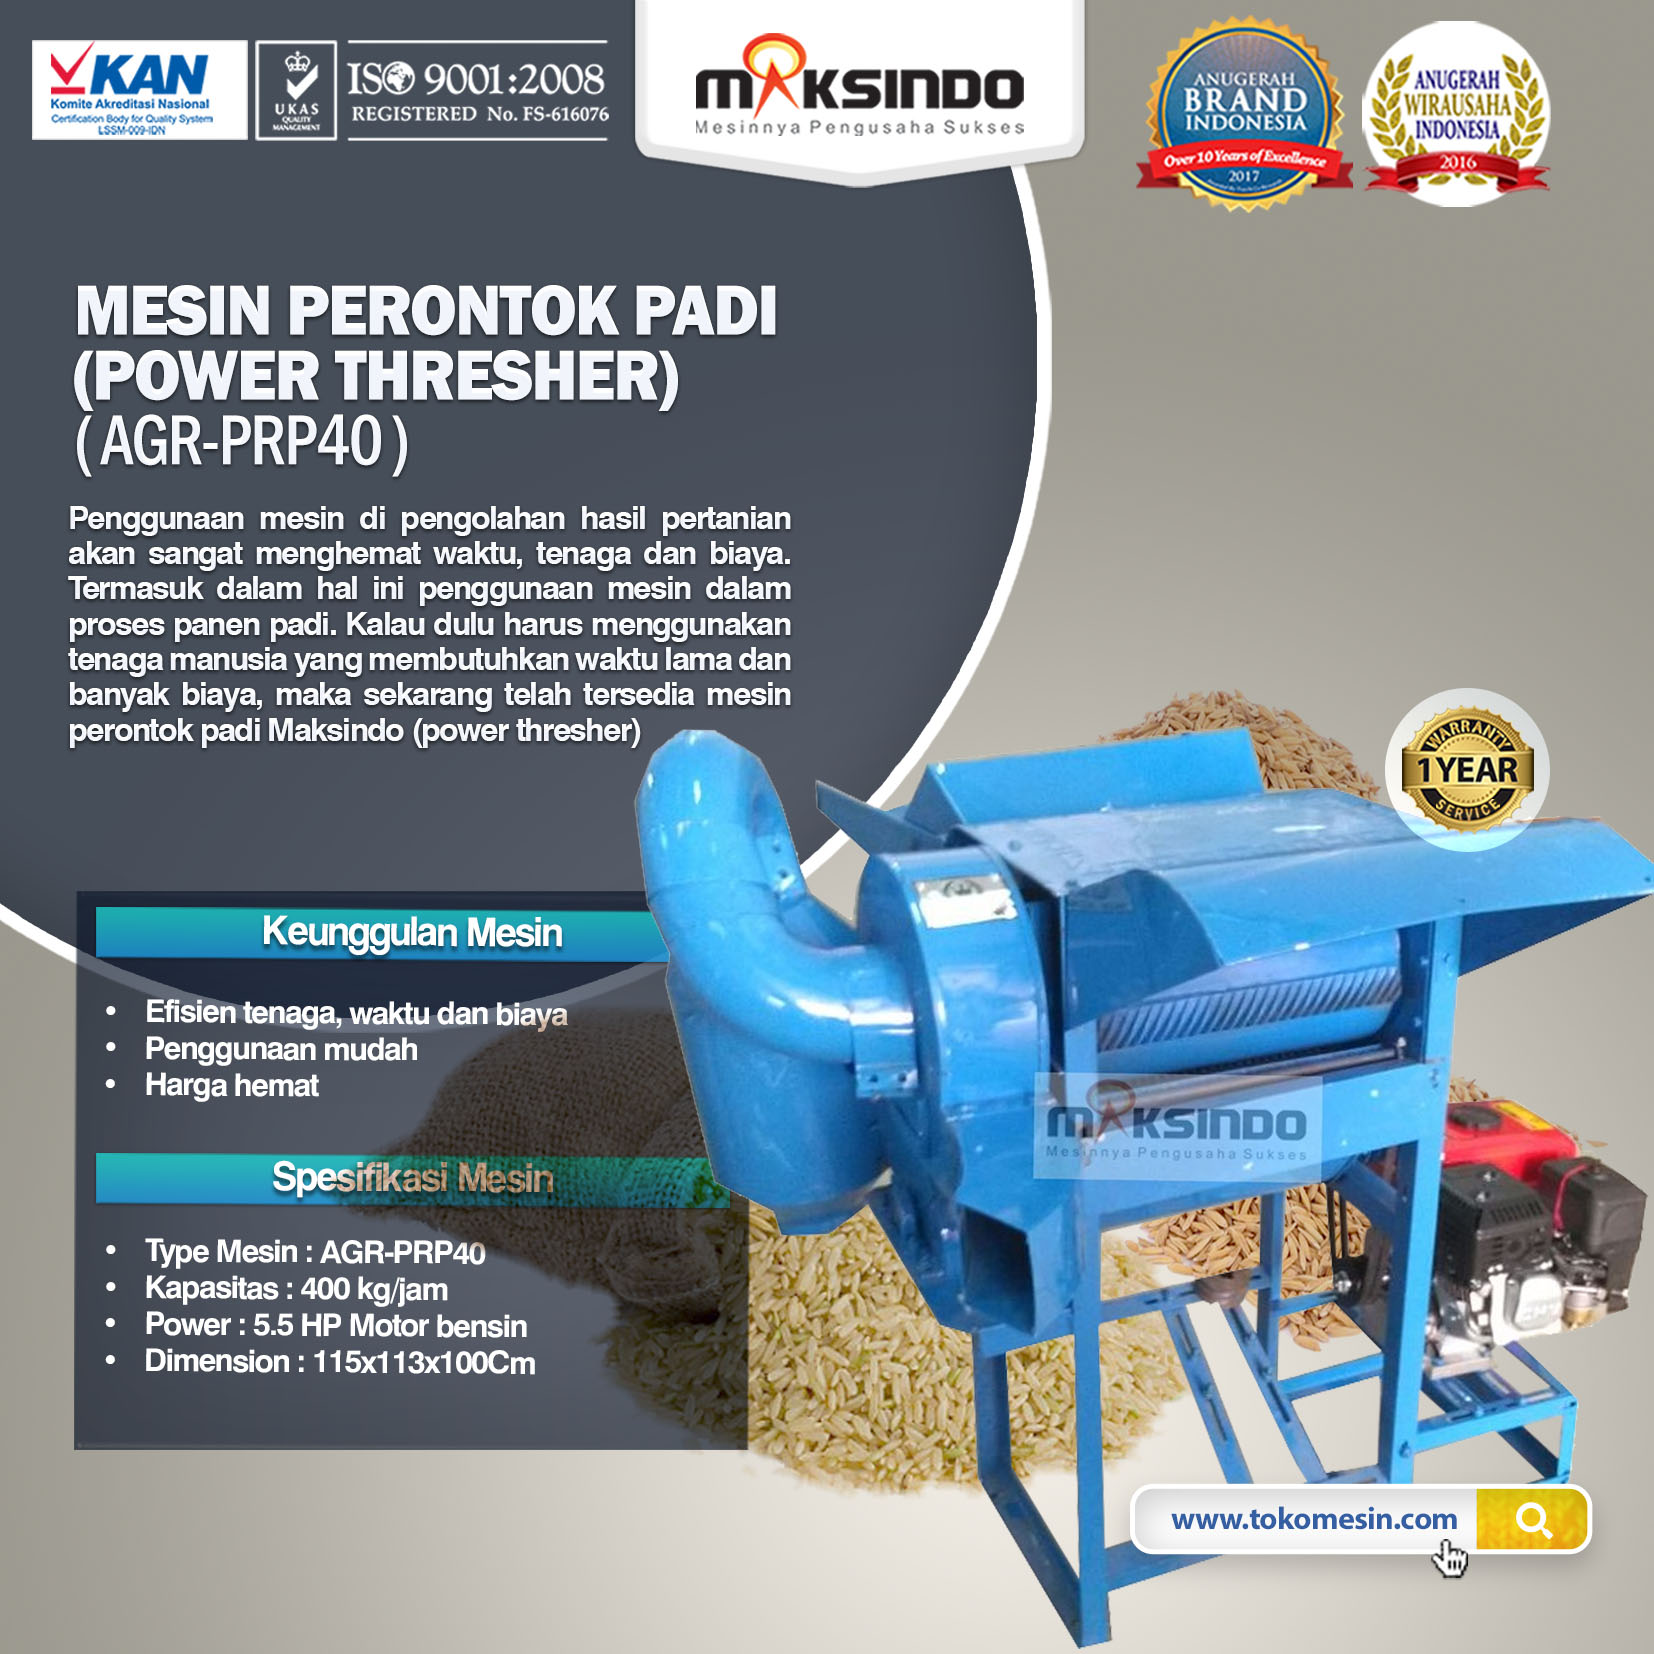 Mesin Perontok Padi (power thresher) (iAGR-PRP40)